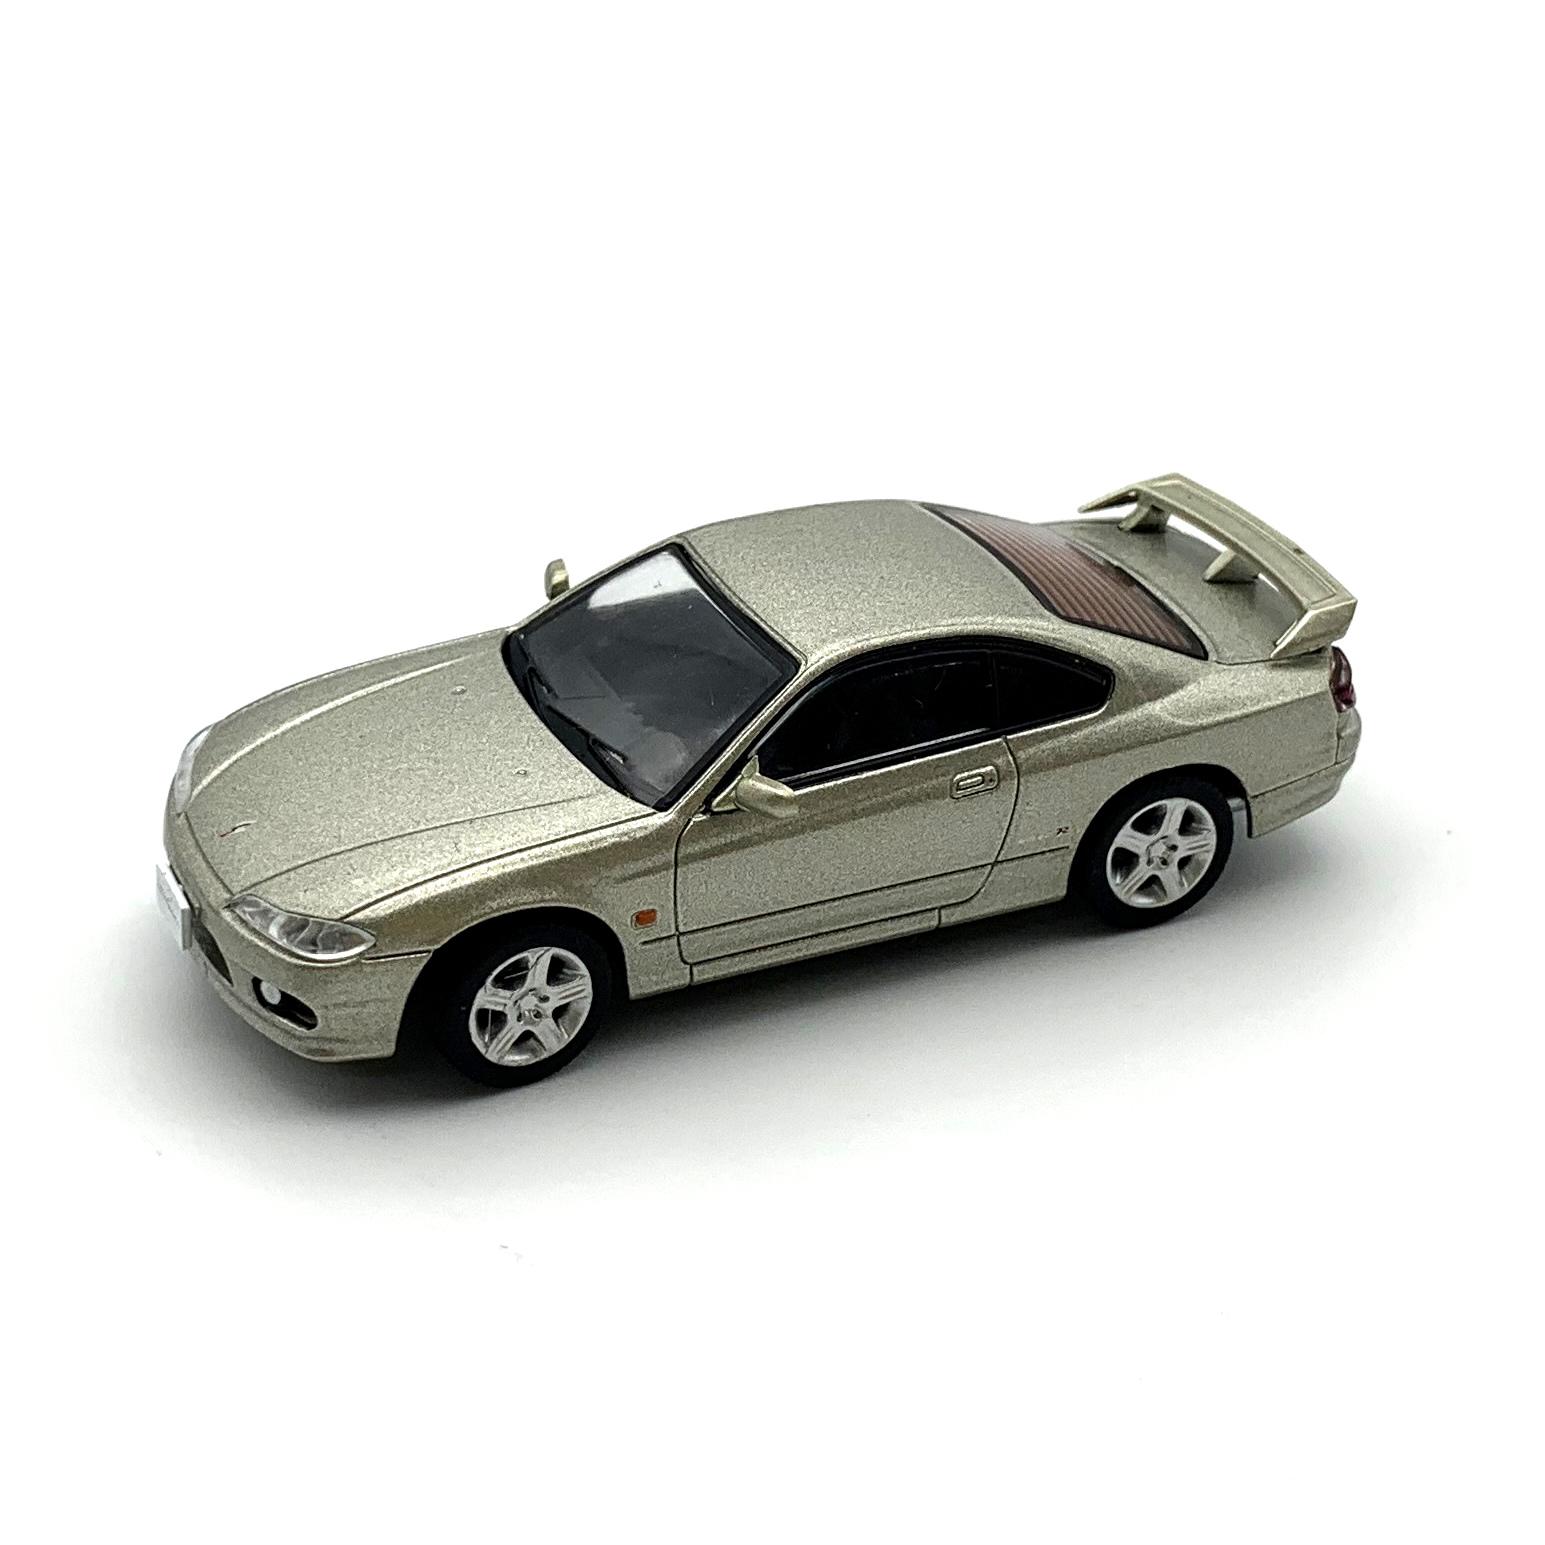 DIECAST MASTERS 日産 シルビア S15 シルバー LHD